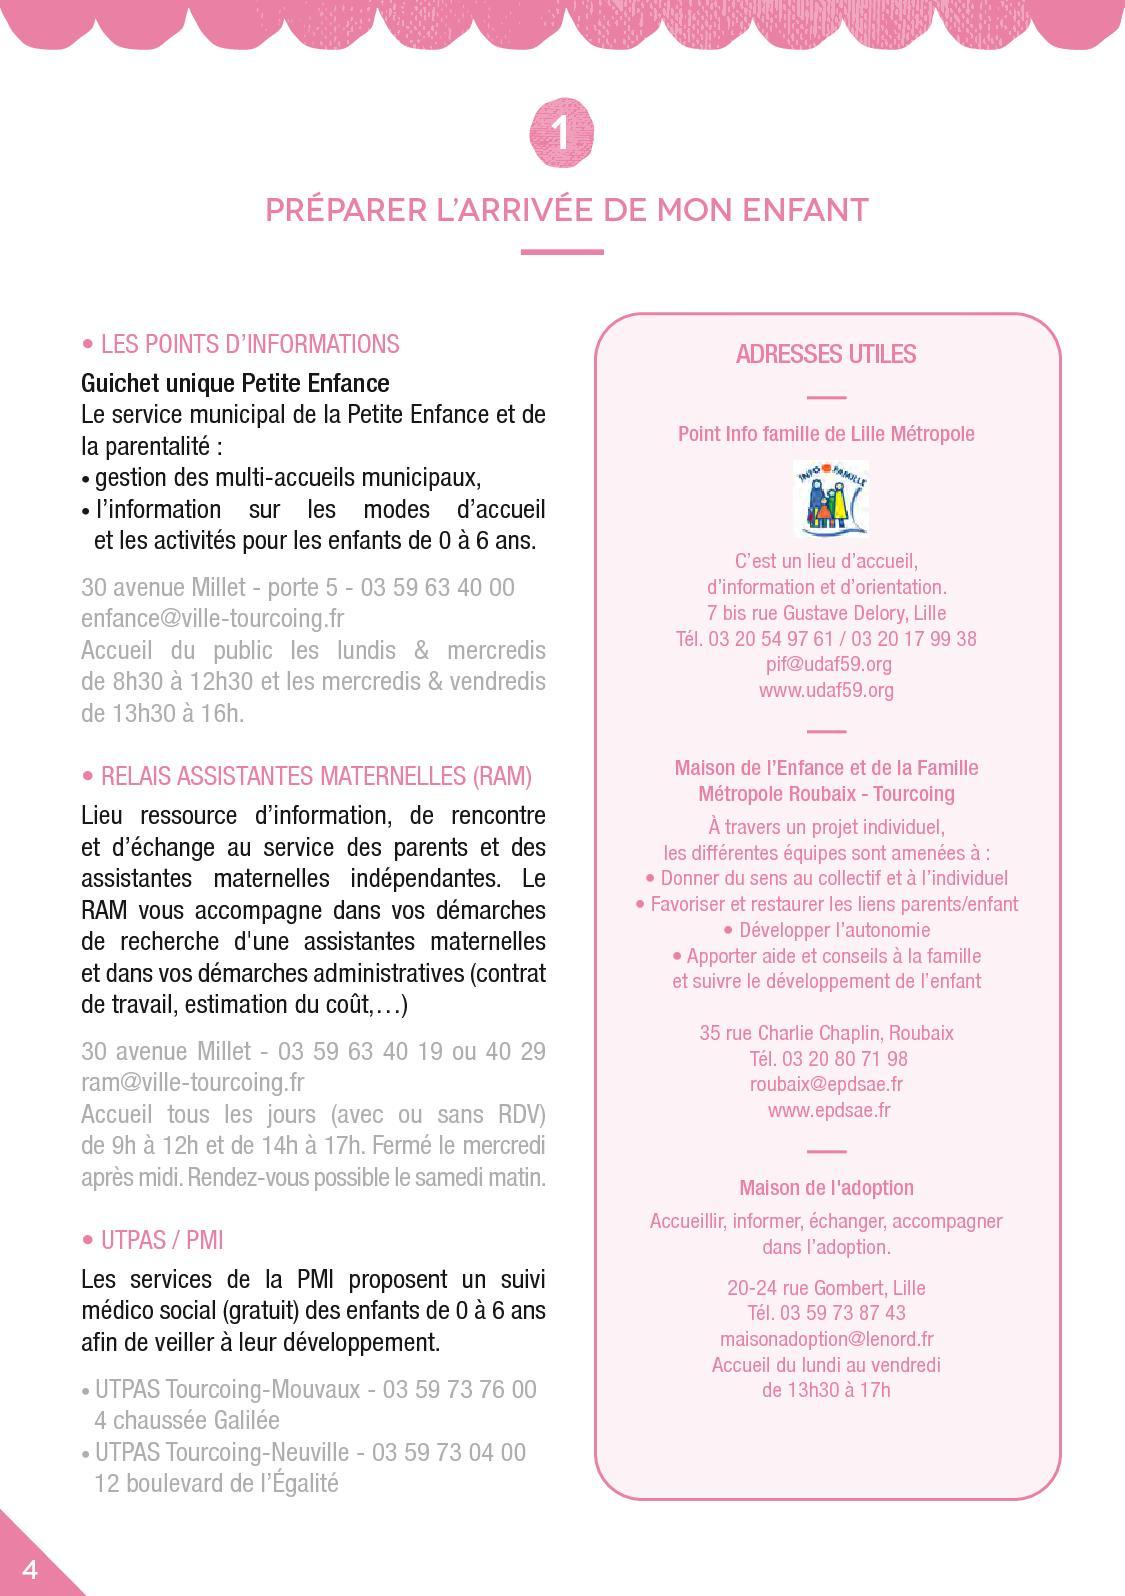 Guide Petite Enfance Calameo Downloader